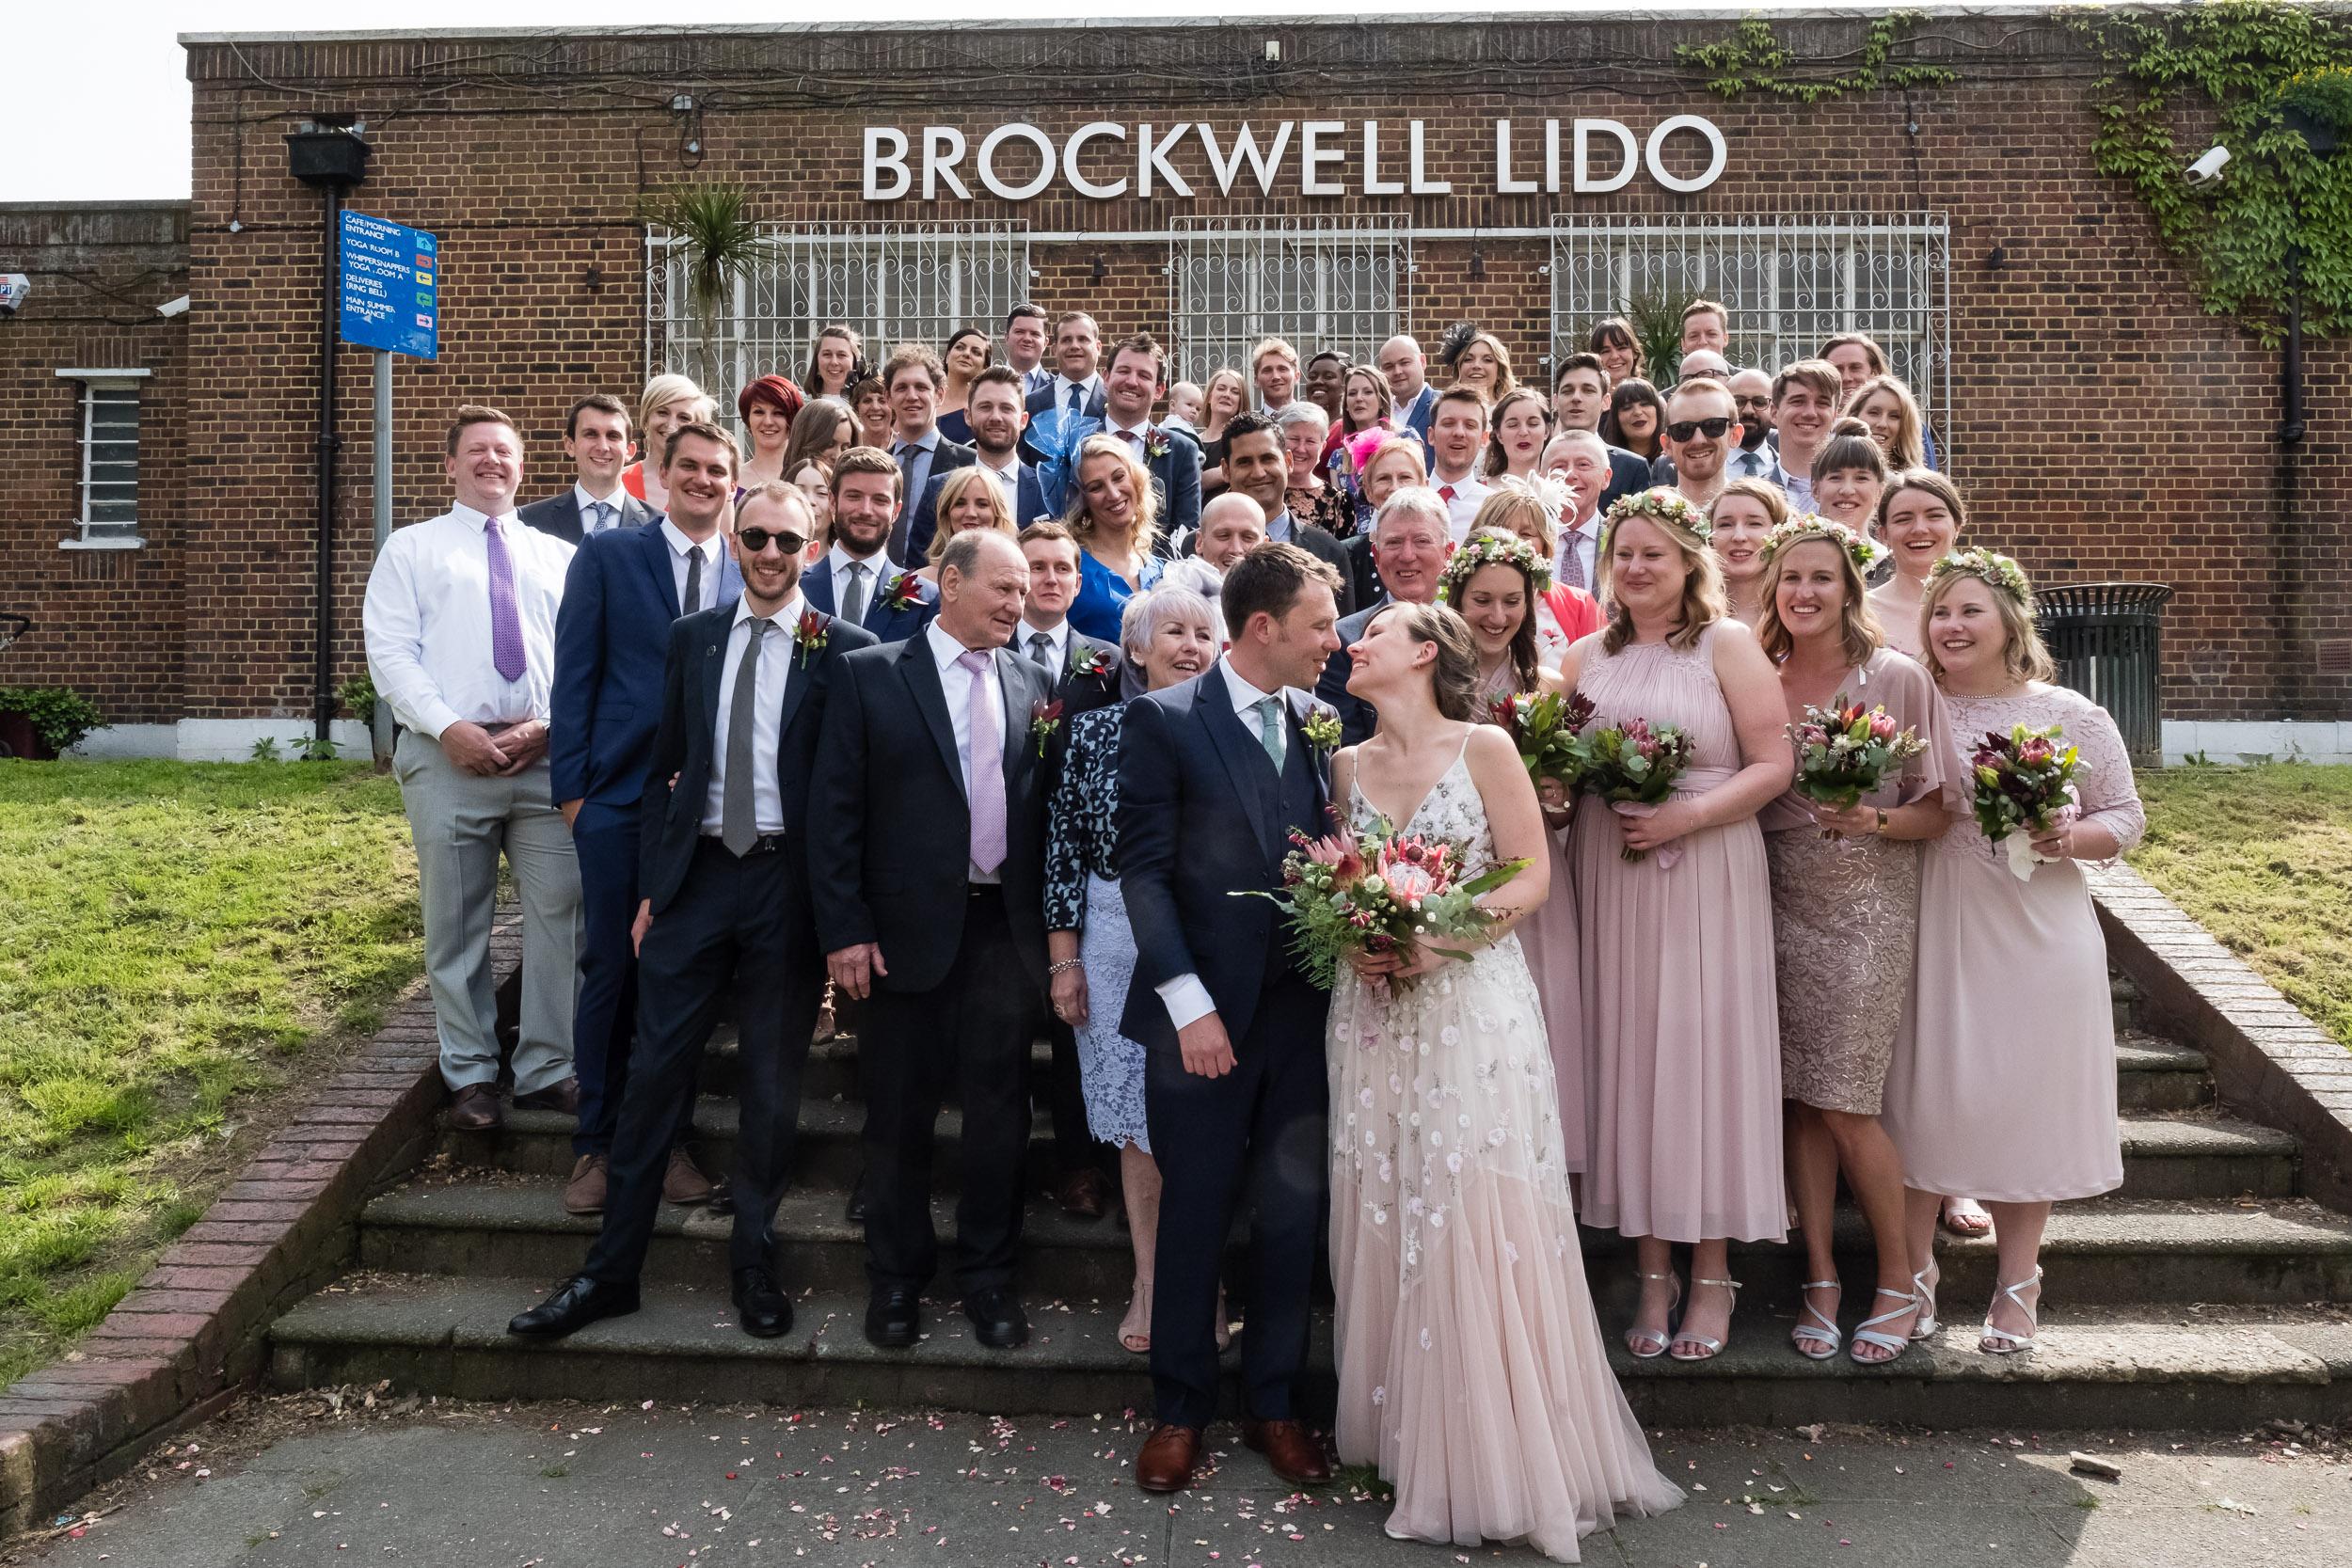 brockwell-lido-brixton-herne-hill-wedding-225.jpg